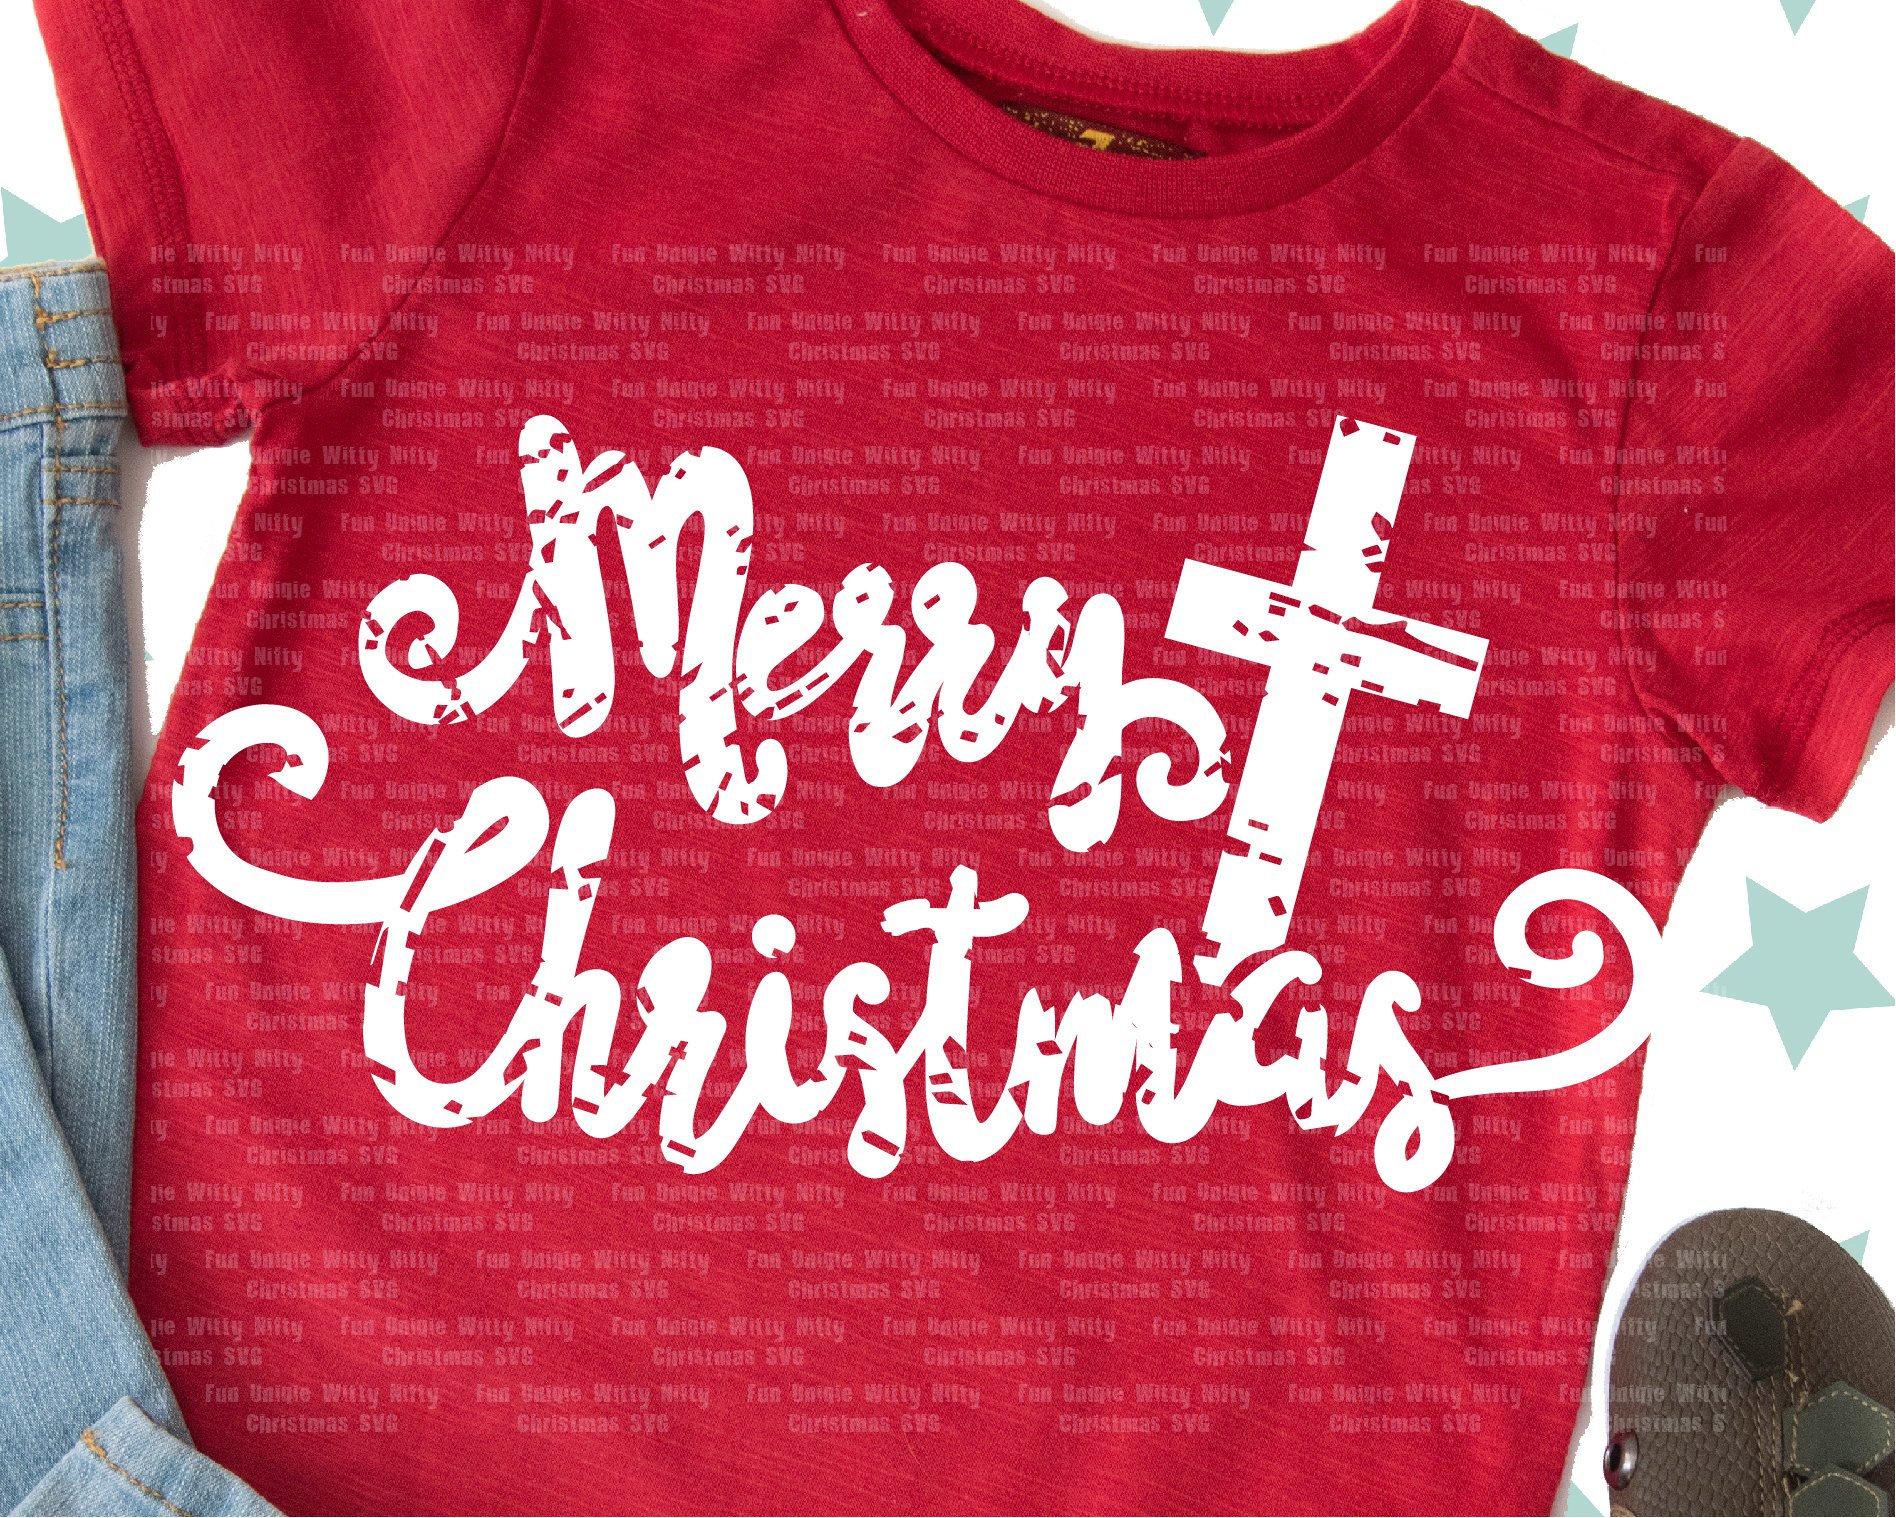 Merry Christmas svg, Spiritual religious Grunge distressed svg files for  cricut, Nativity svg, Cross svg, Iron on transfer, Digital download